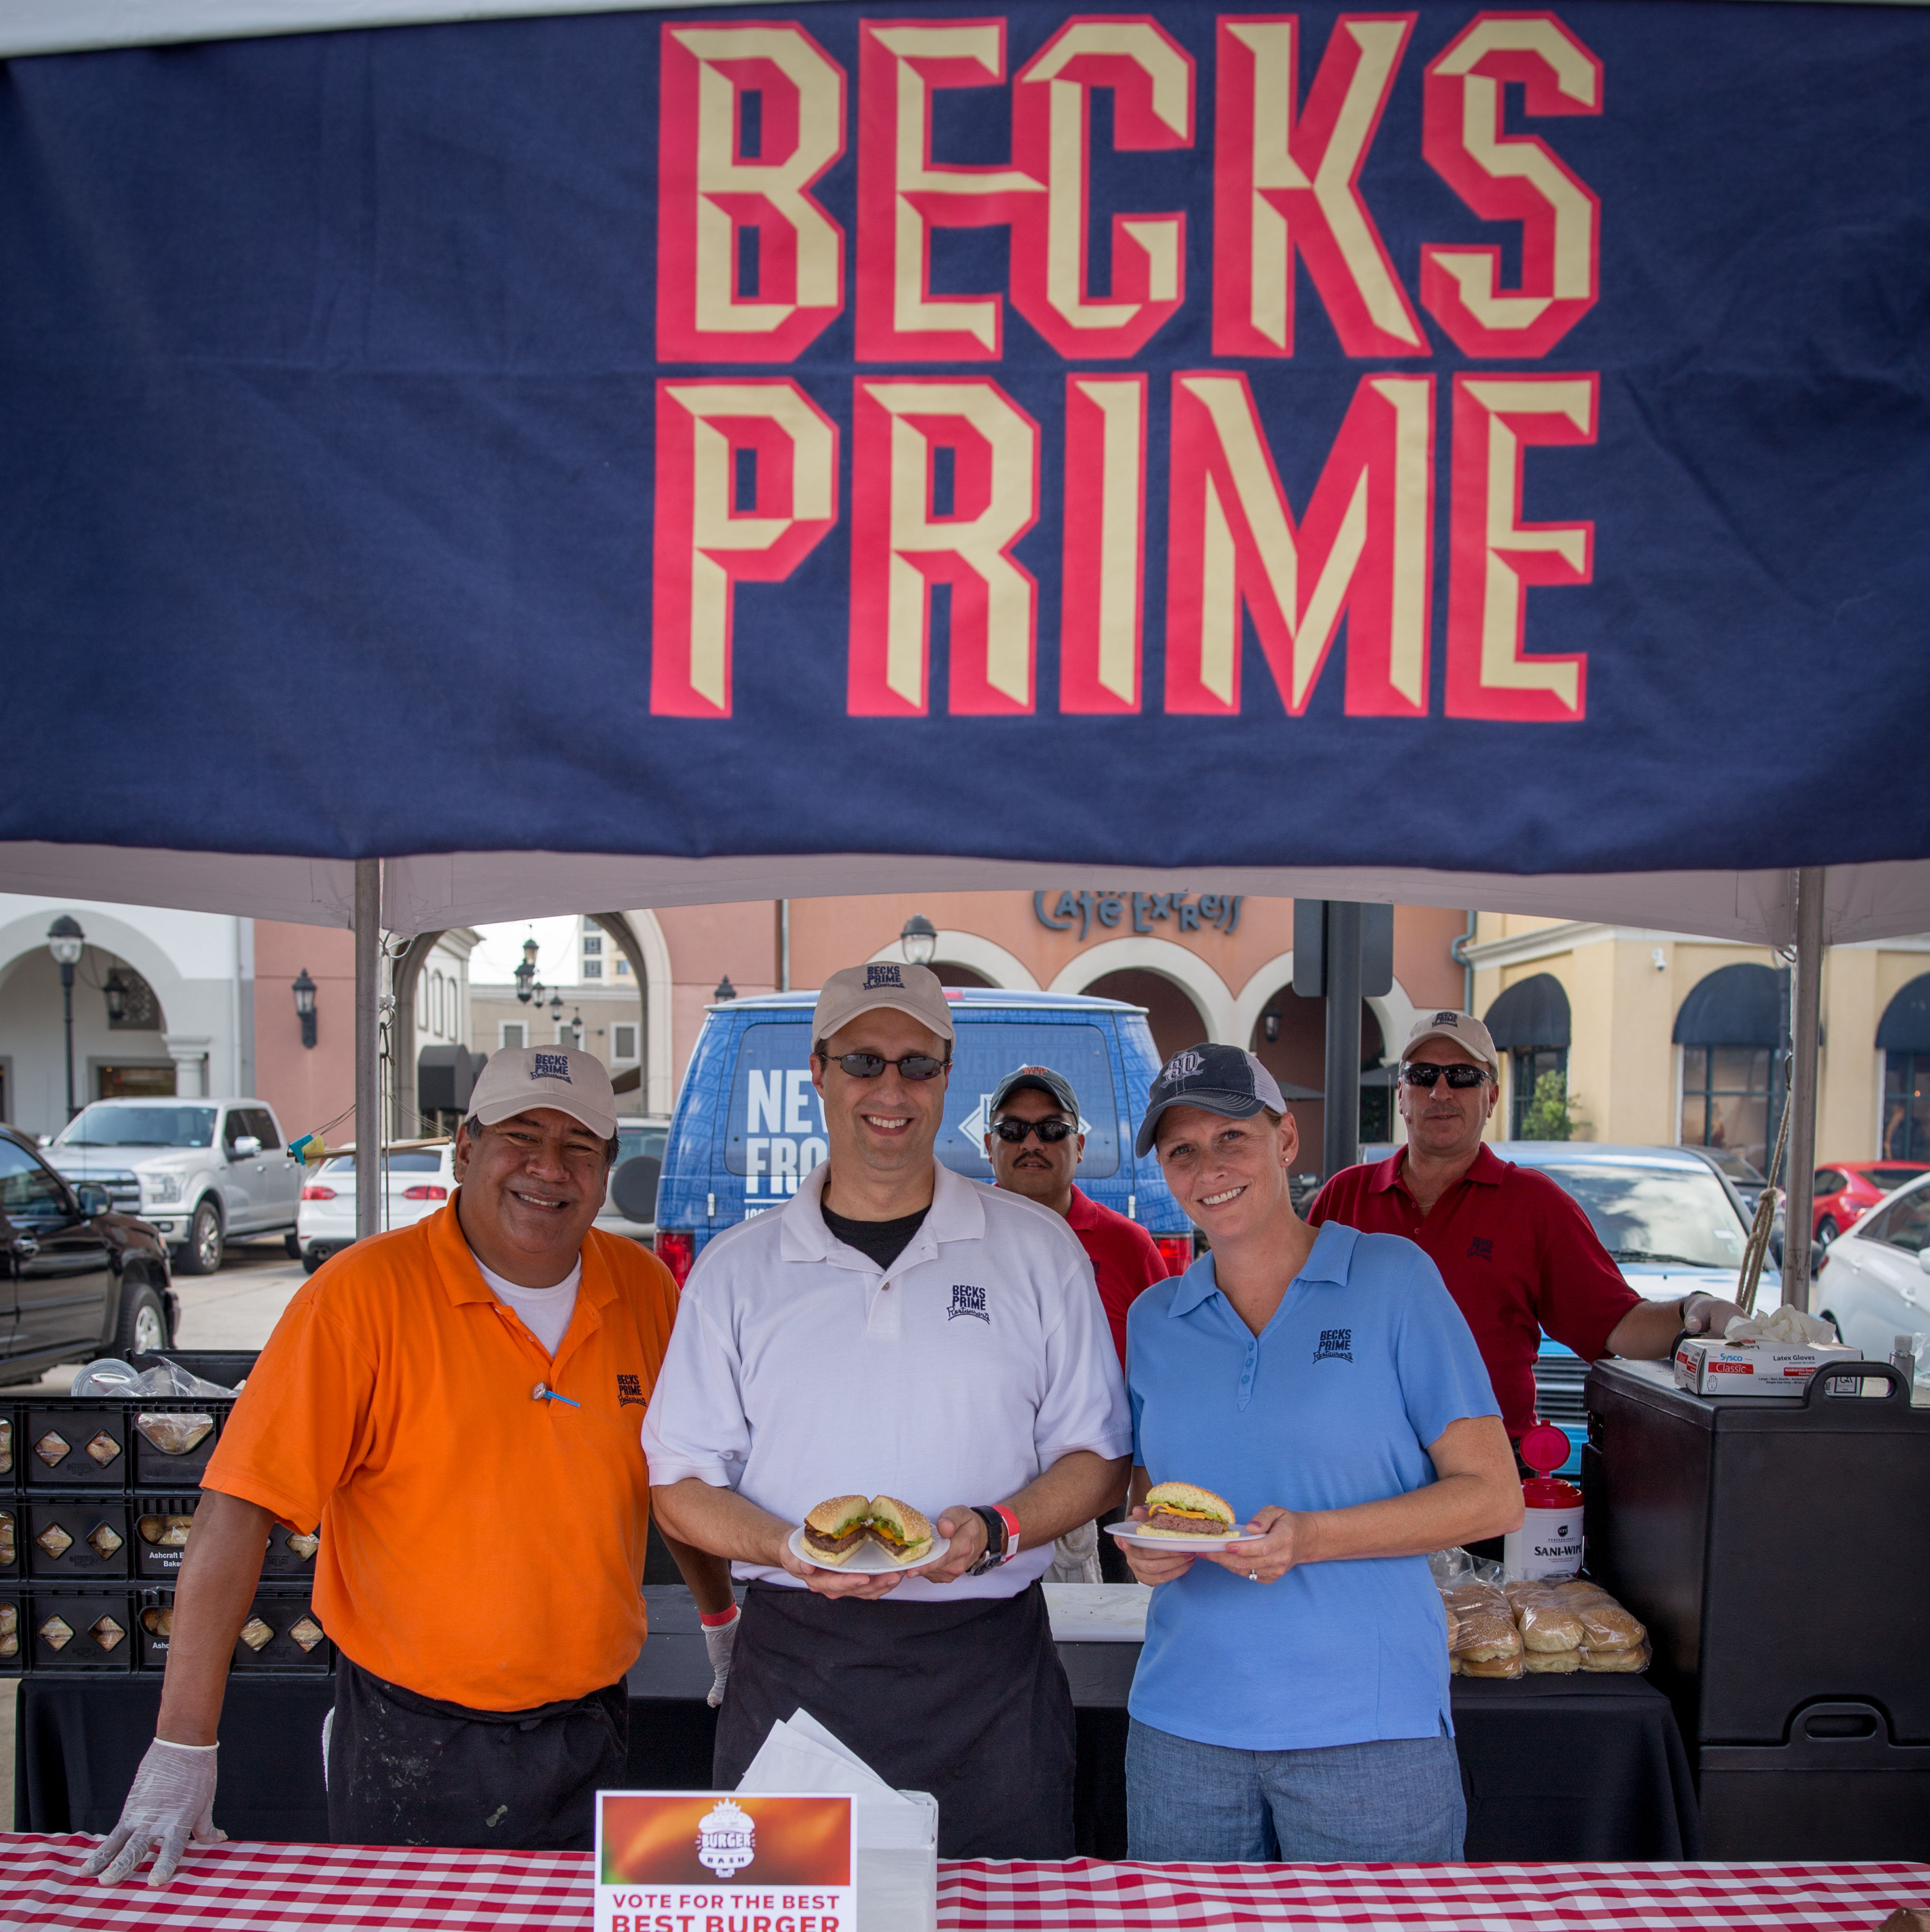 Becks prime team rmjcvf